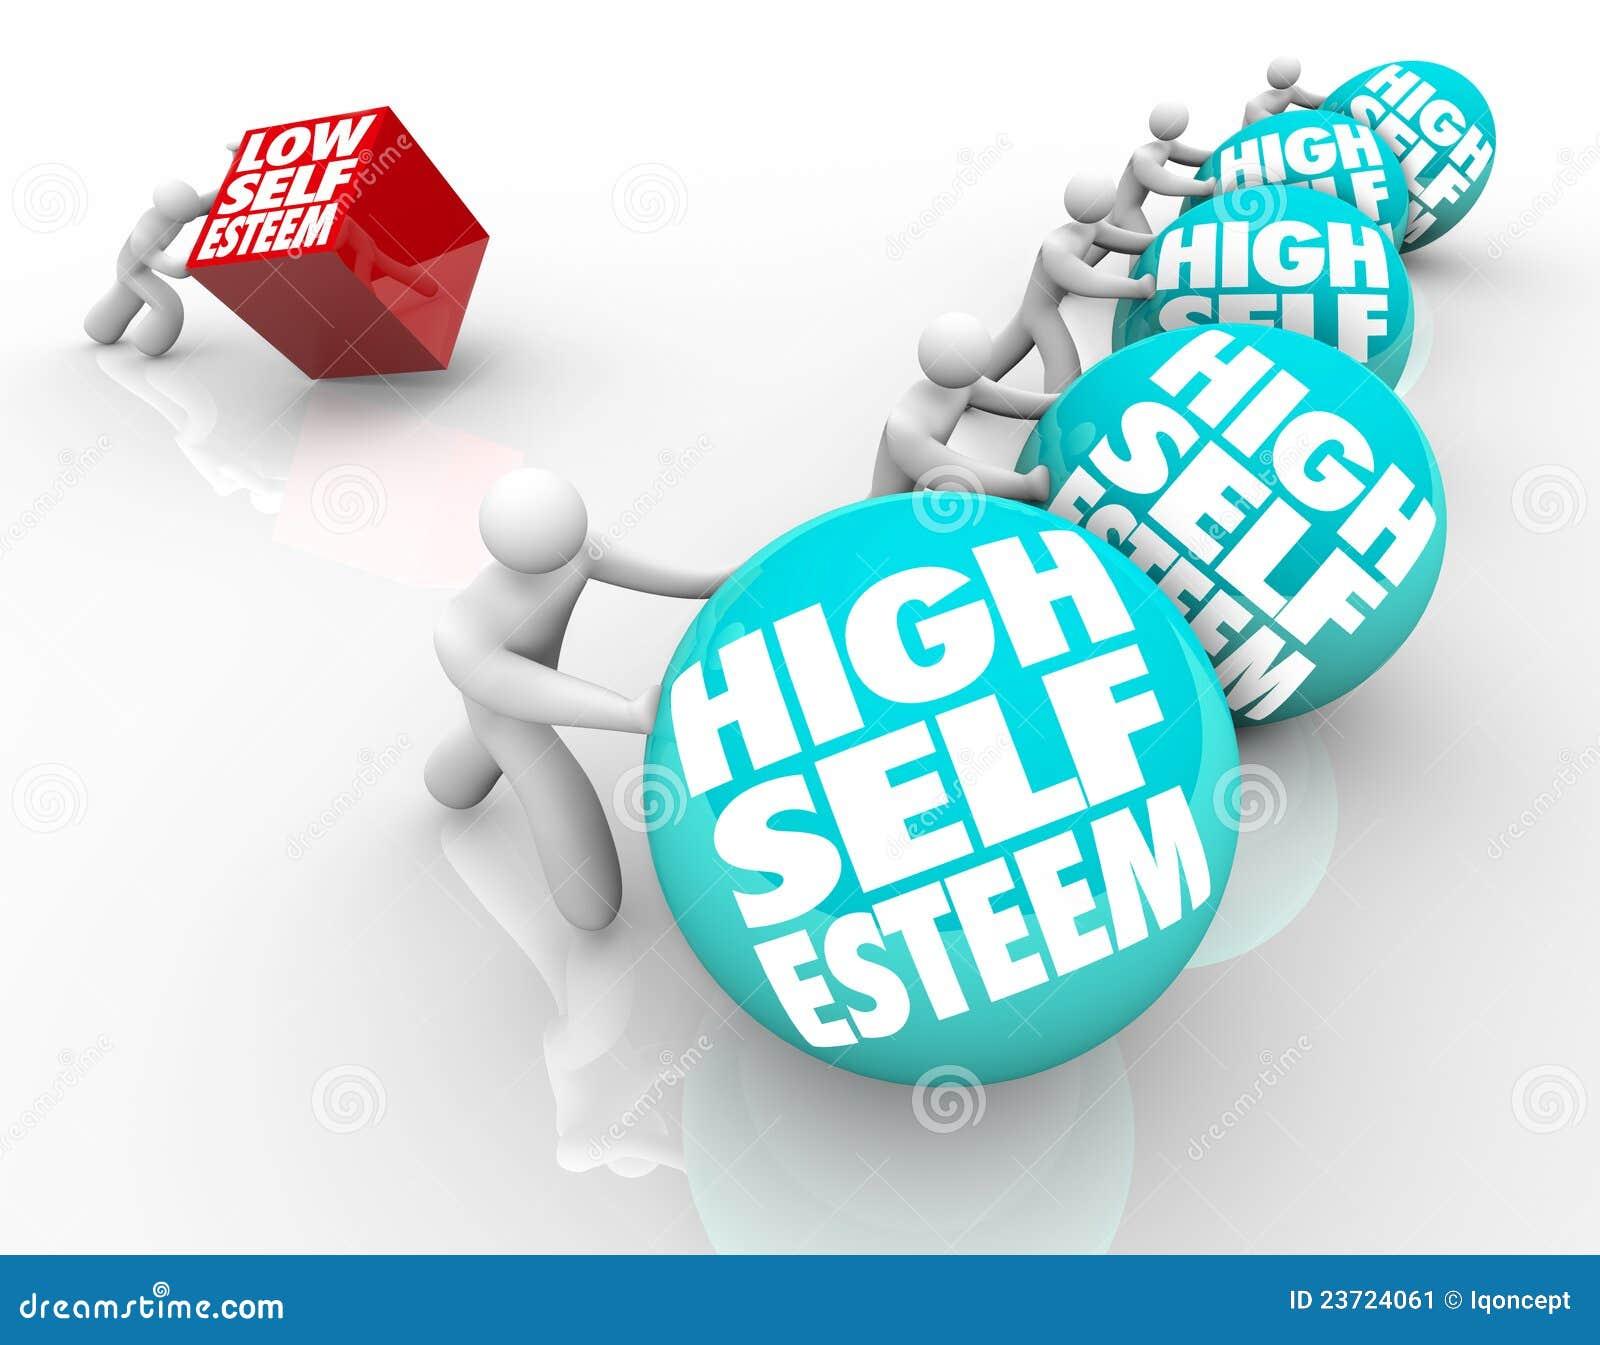 People with high self esteem high vs low self esteem losing